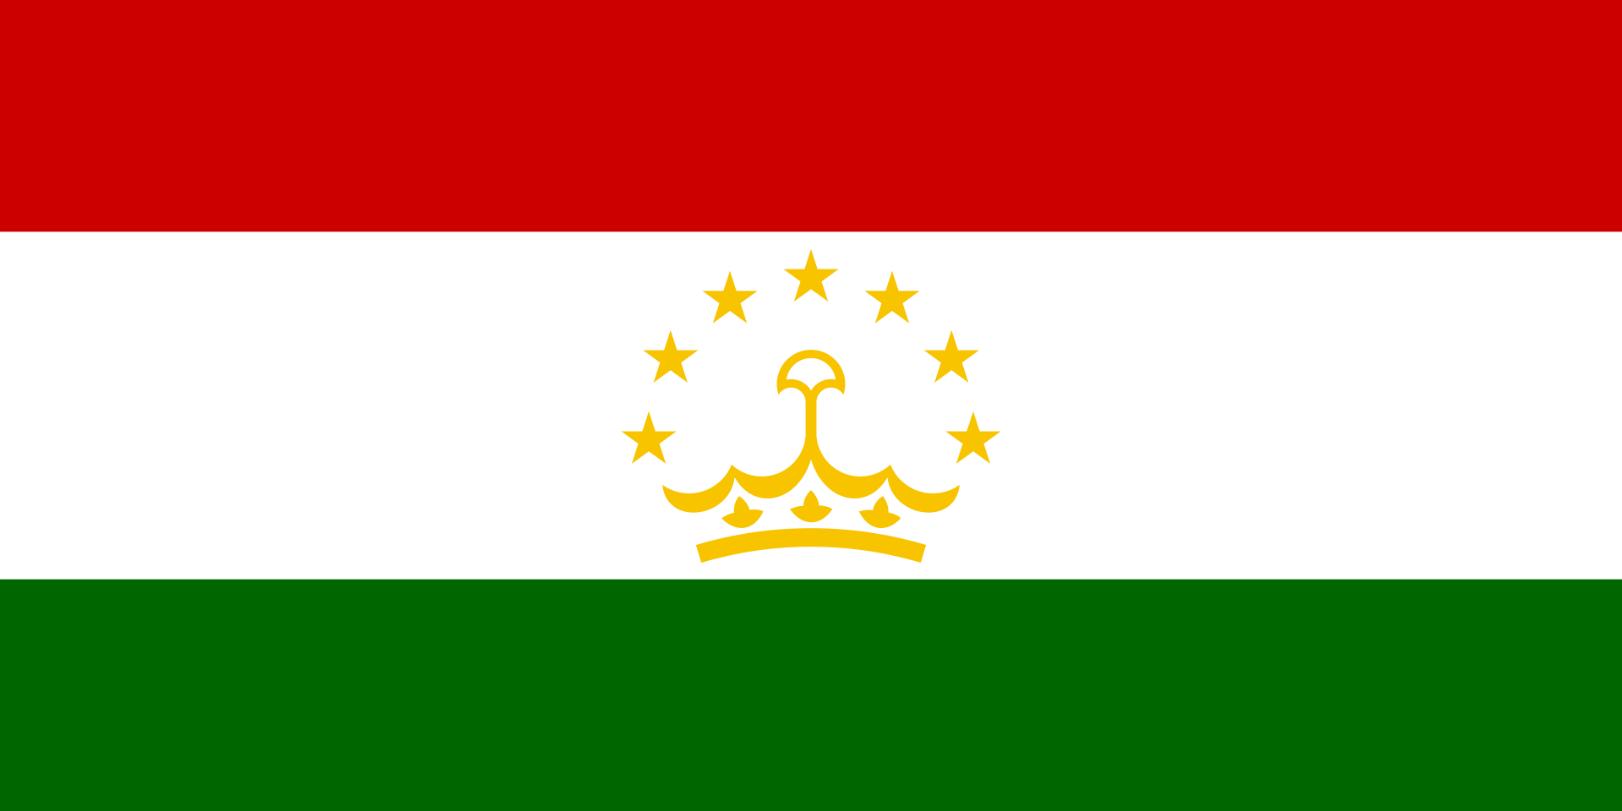 Flagge im Querformat Land Tadschikistan 150x100 cm